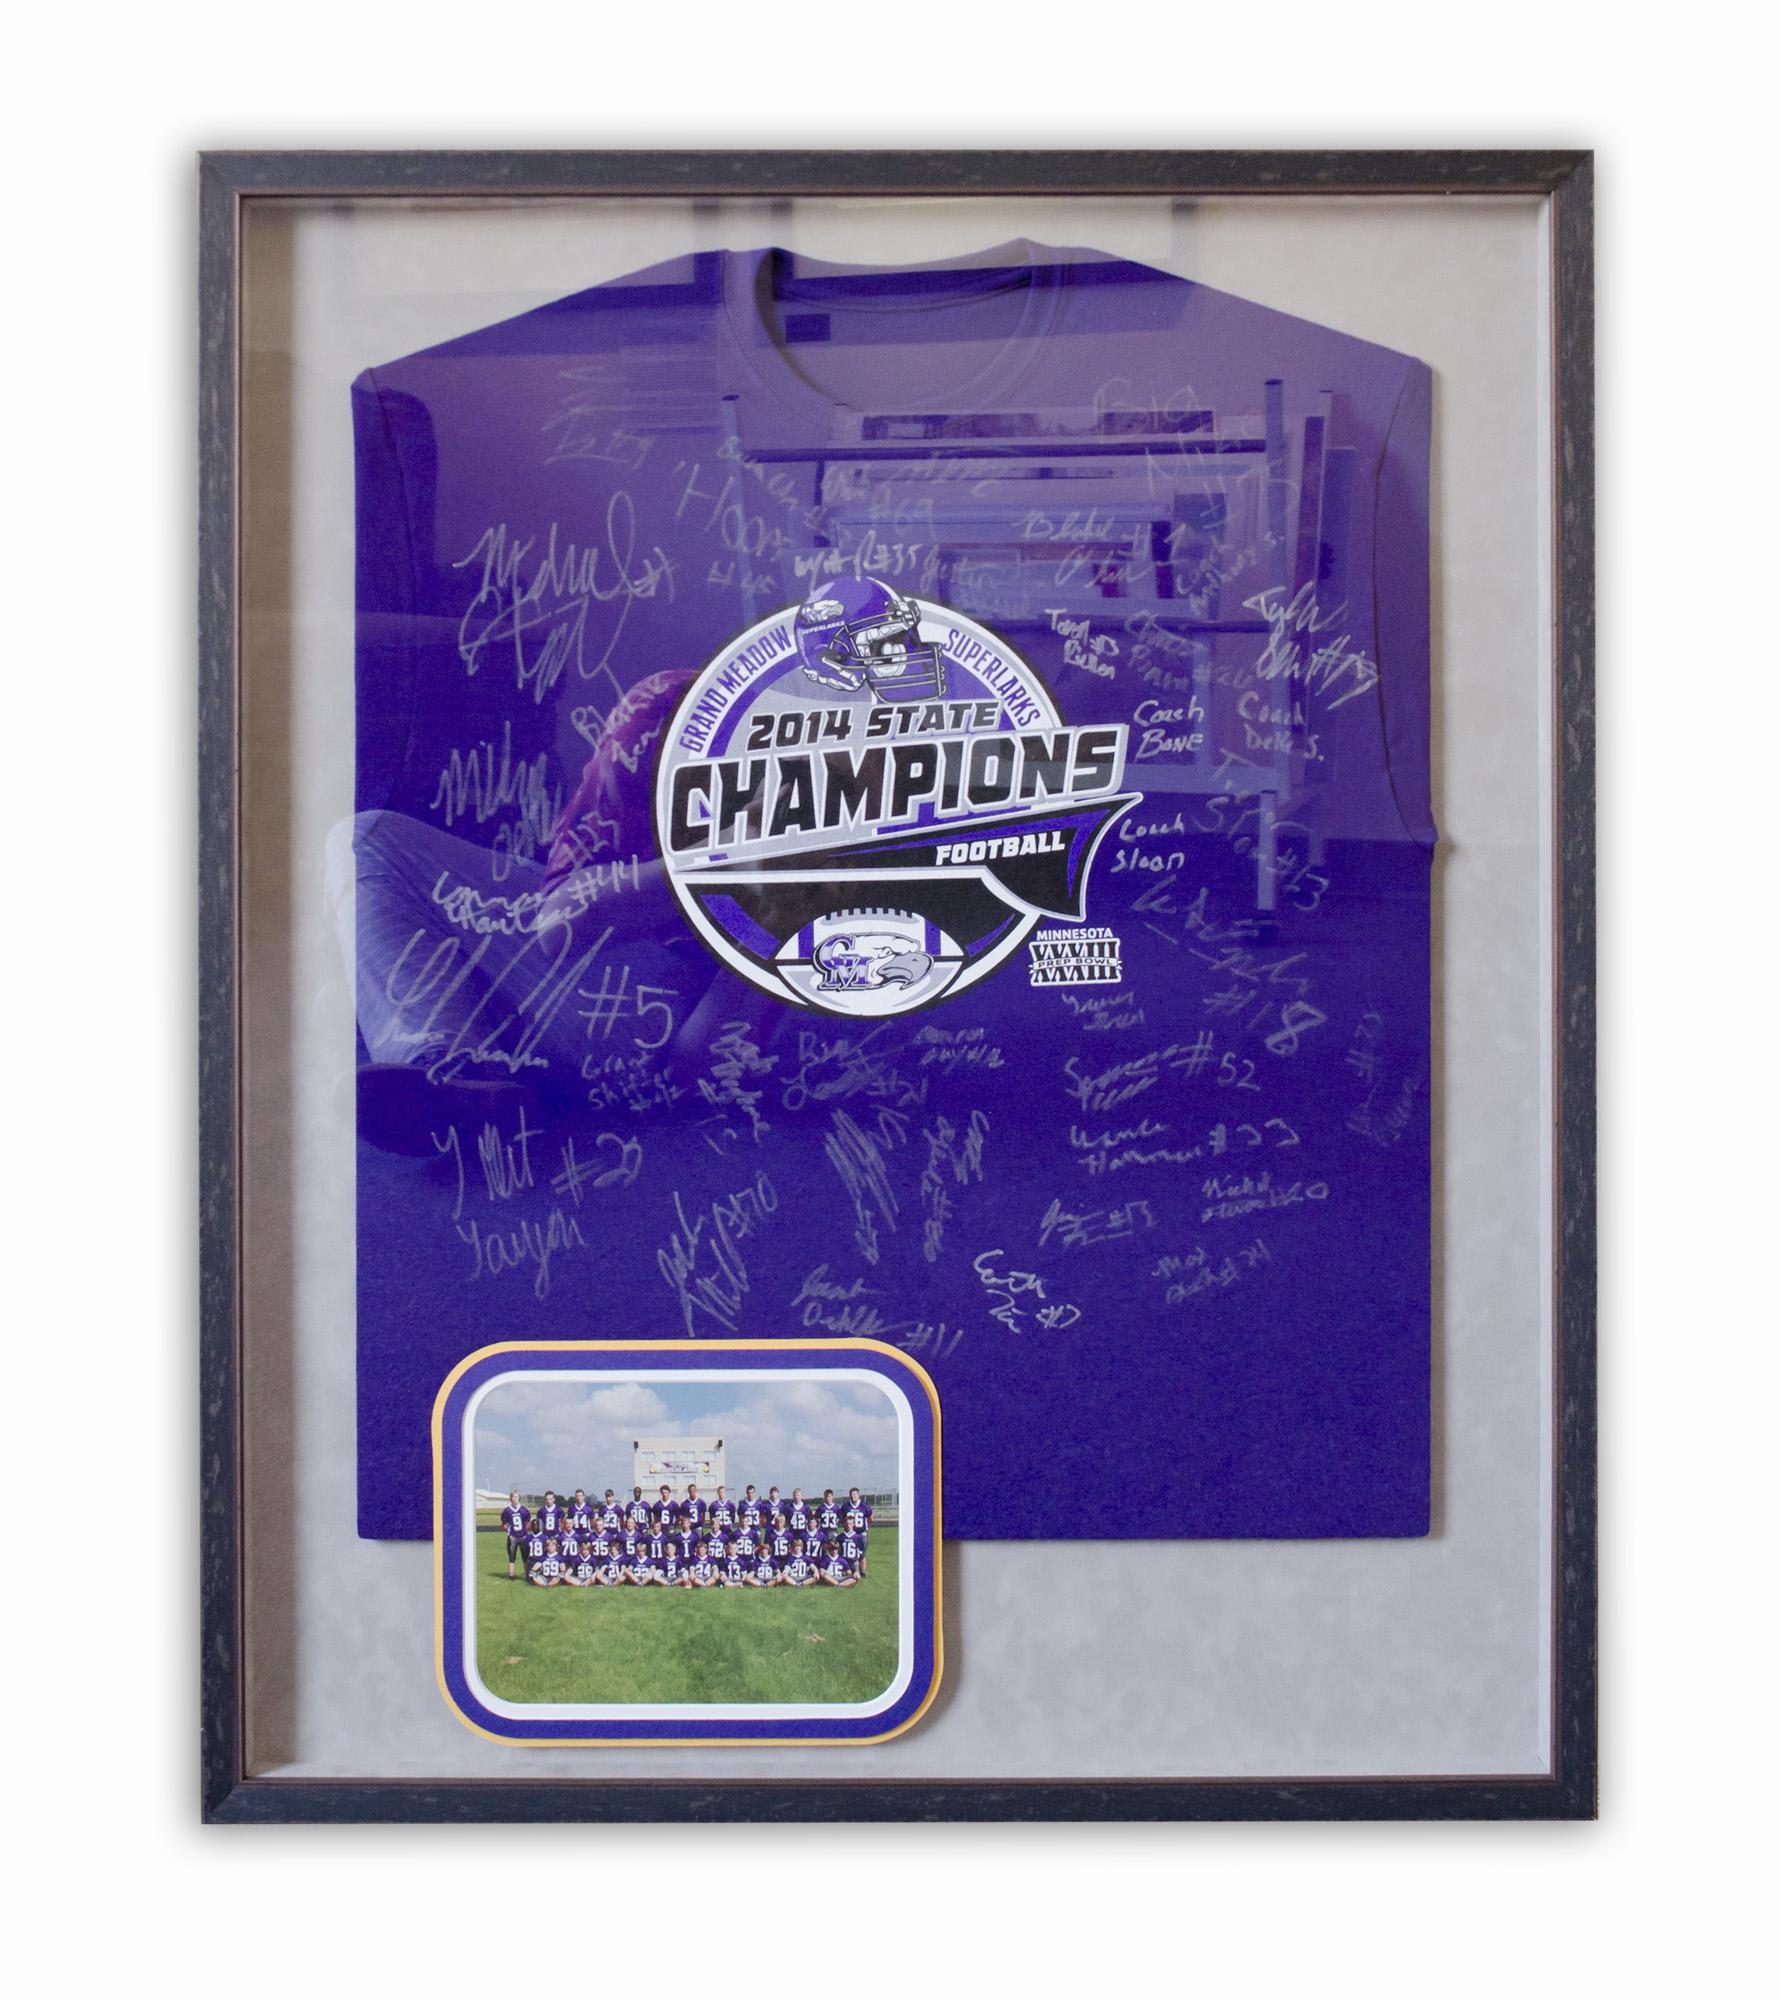 2014 State Champions Shirt